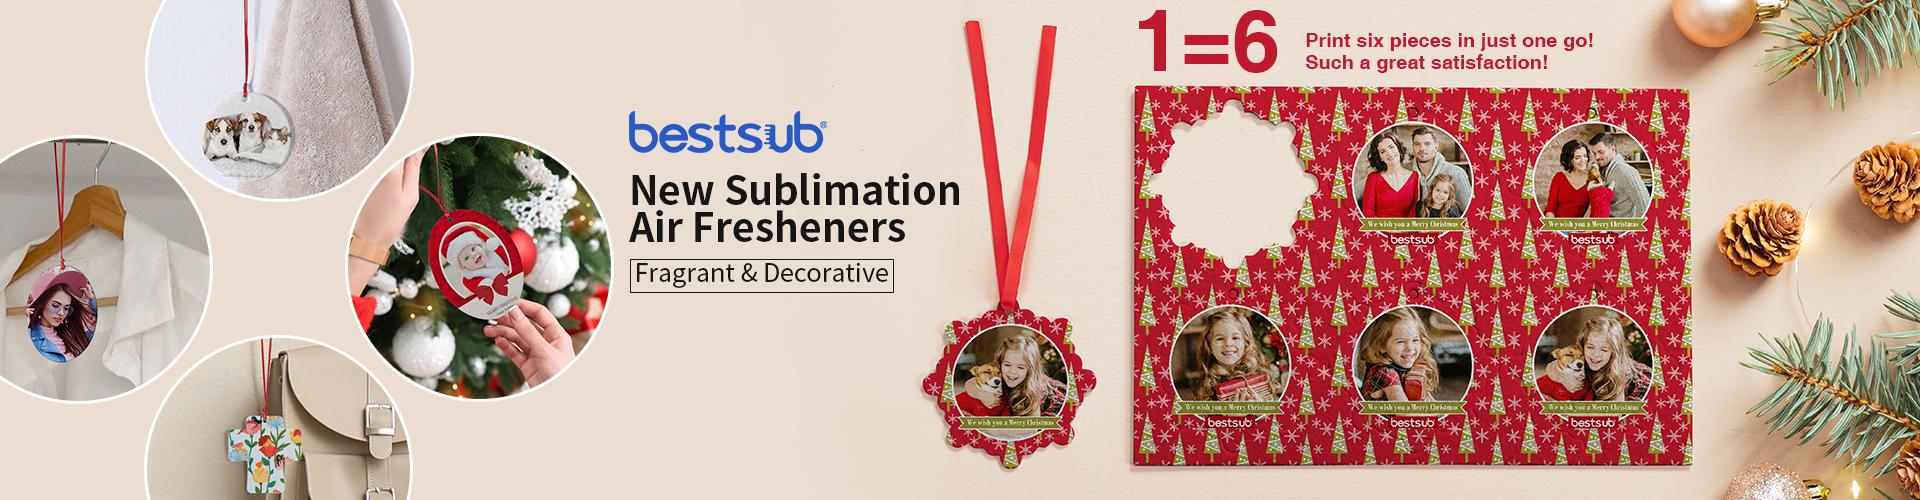 2021-10-09_New_Sublimation_Air_Fresheners_new_web